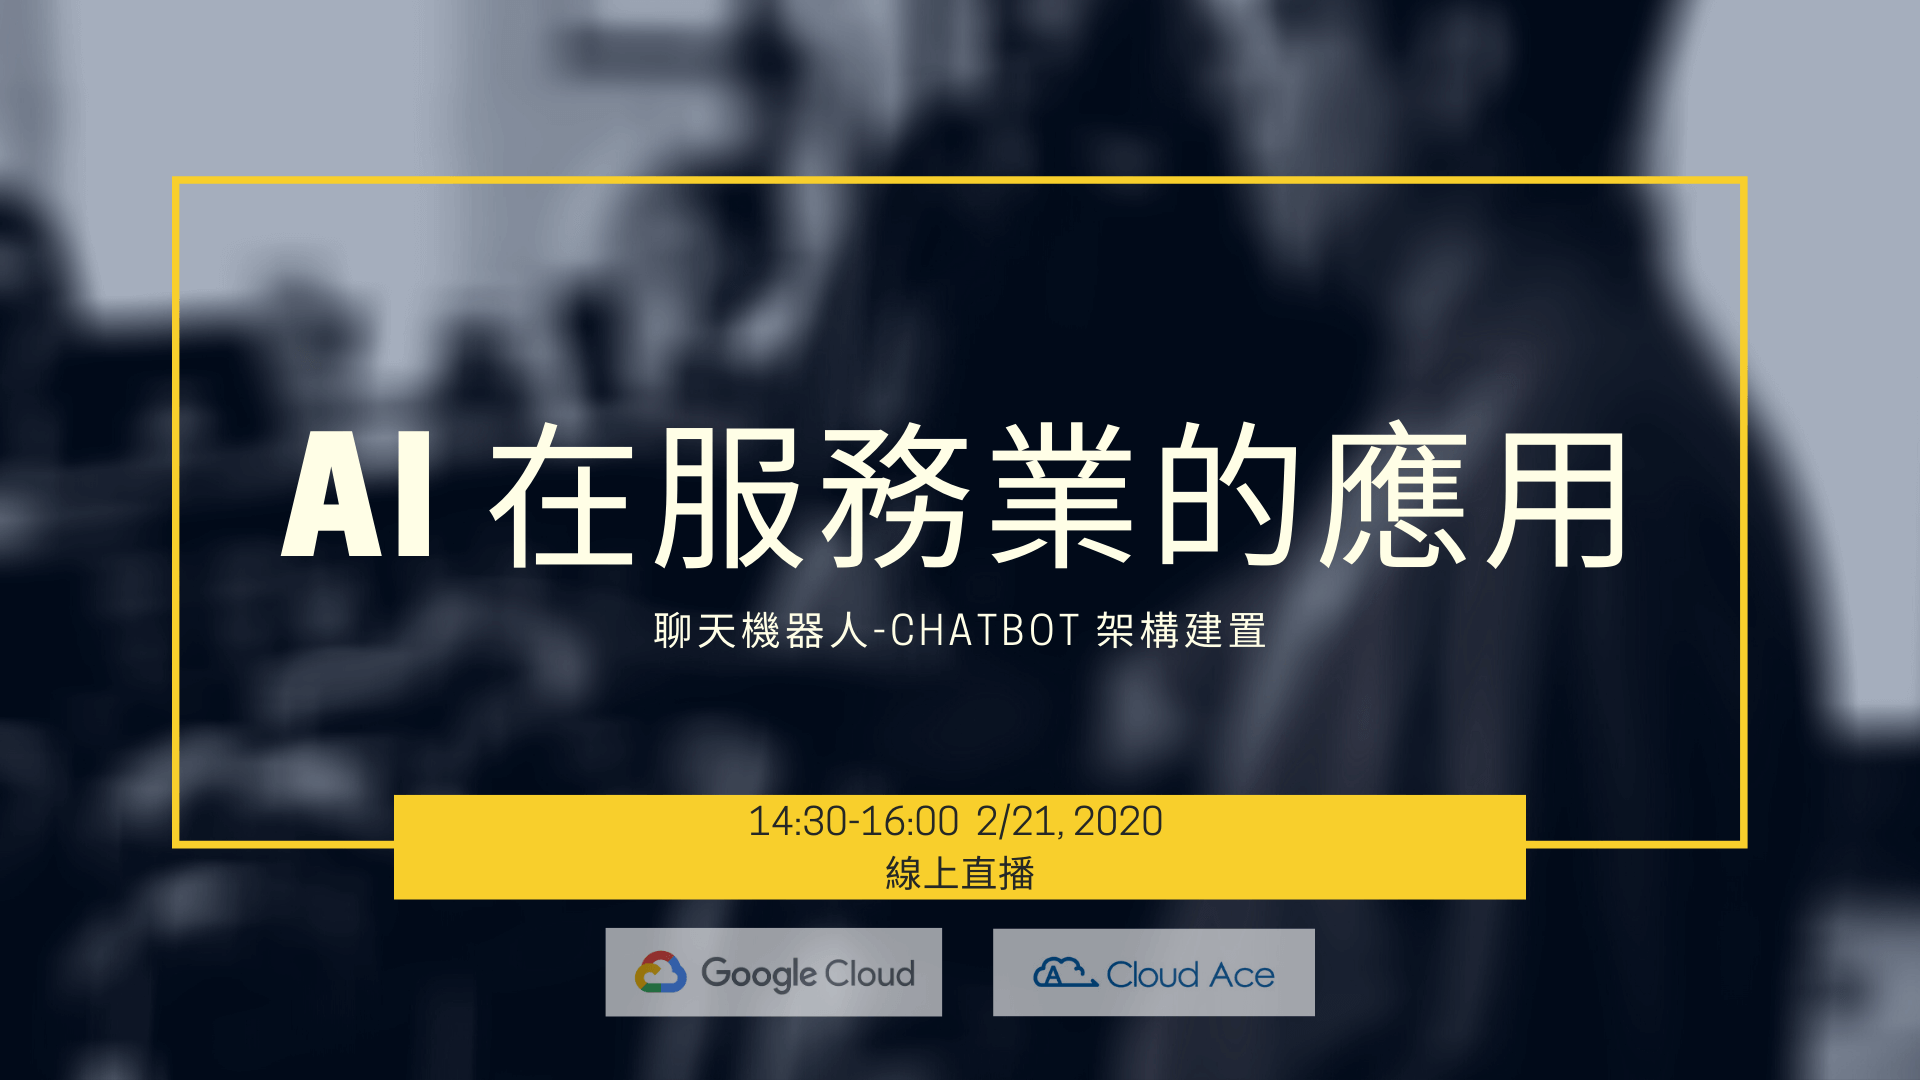 AI 聊天機器人_Chatbot 架構建置